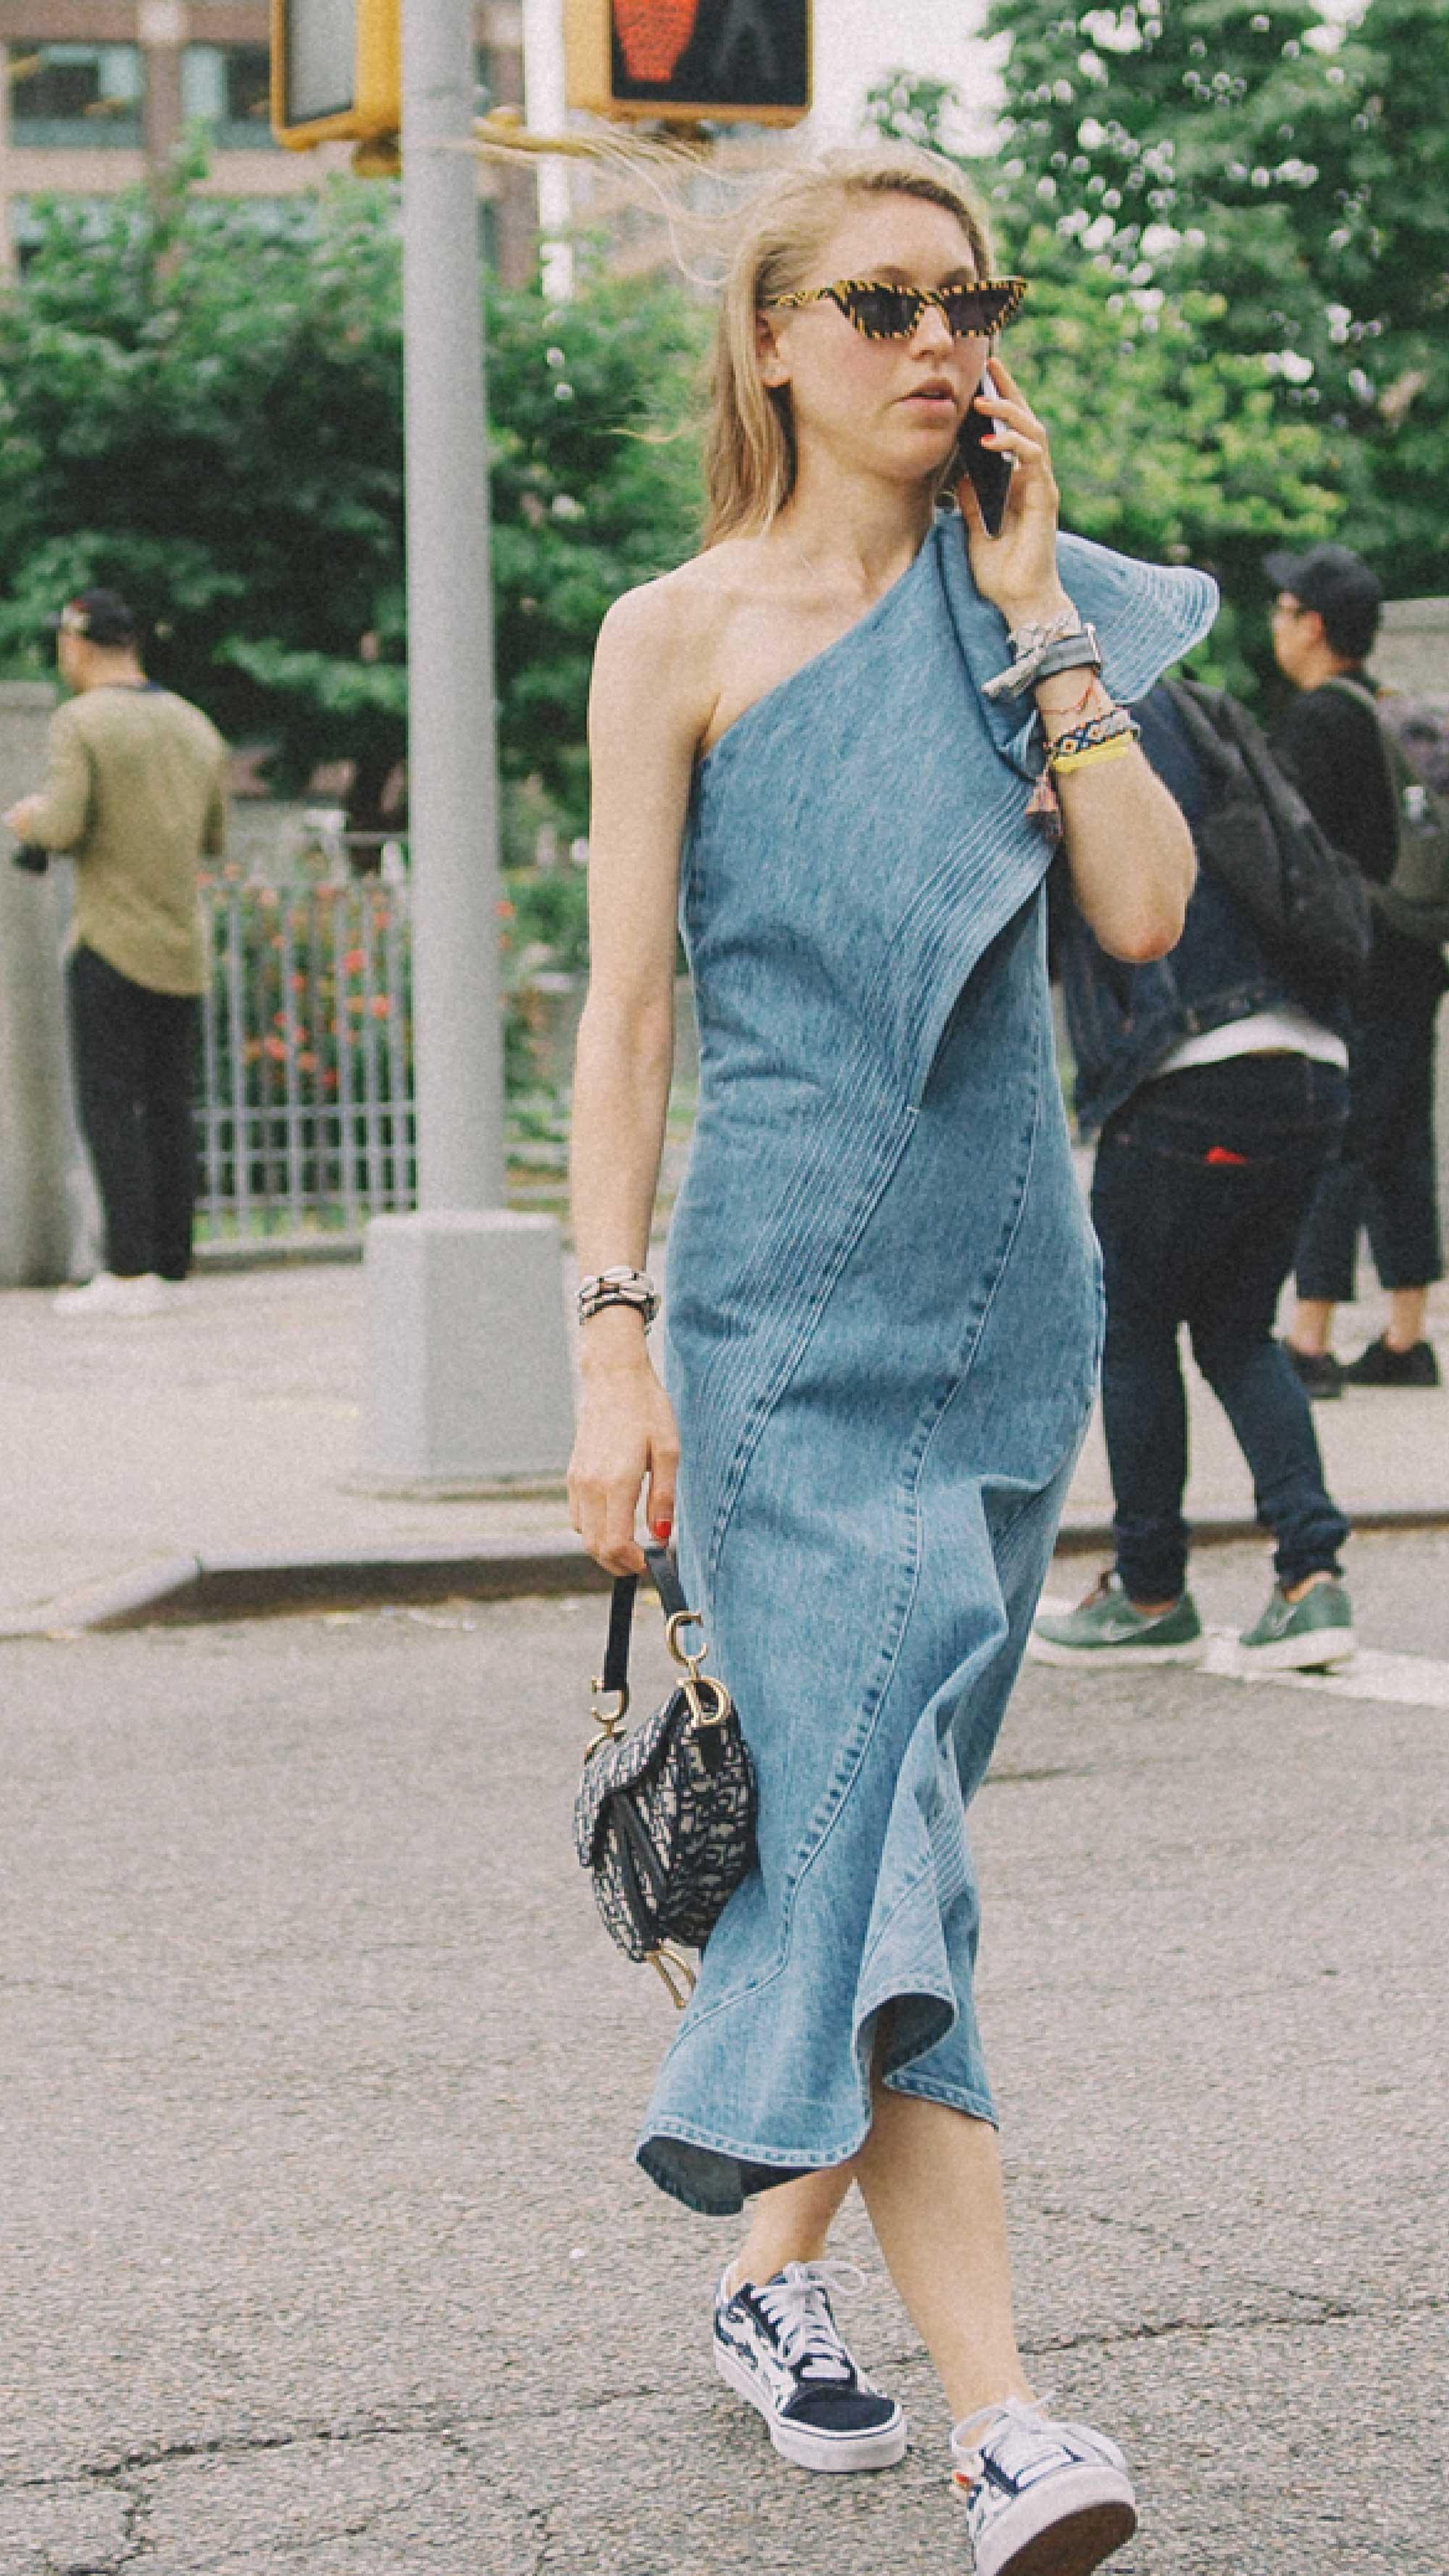 New-York-Fashion-Week-NYFW-SS18-street-style-day-three-SS182.jpg